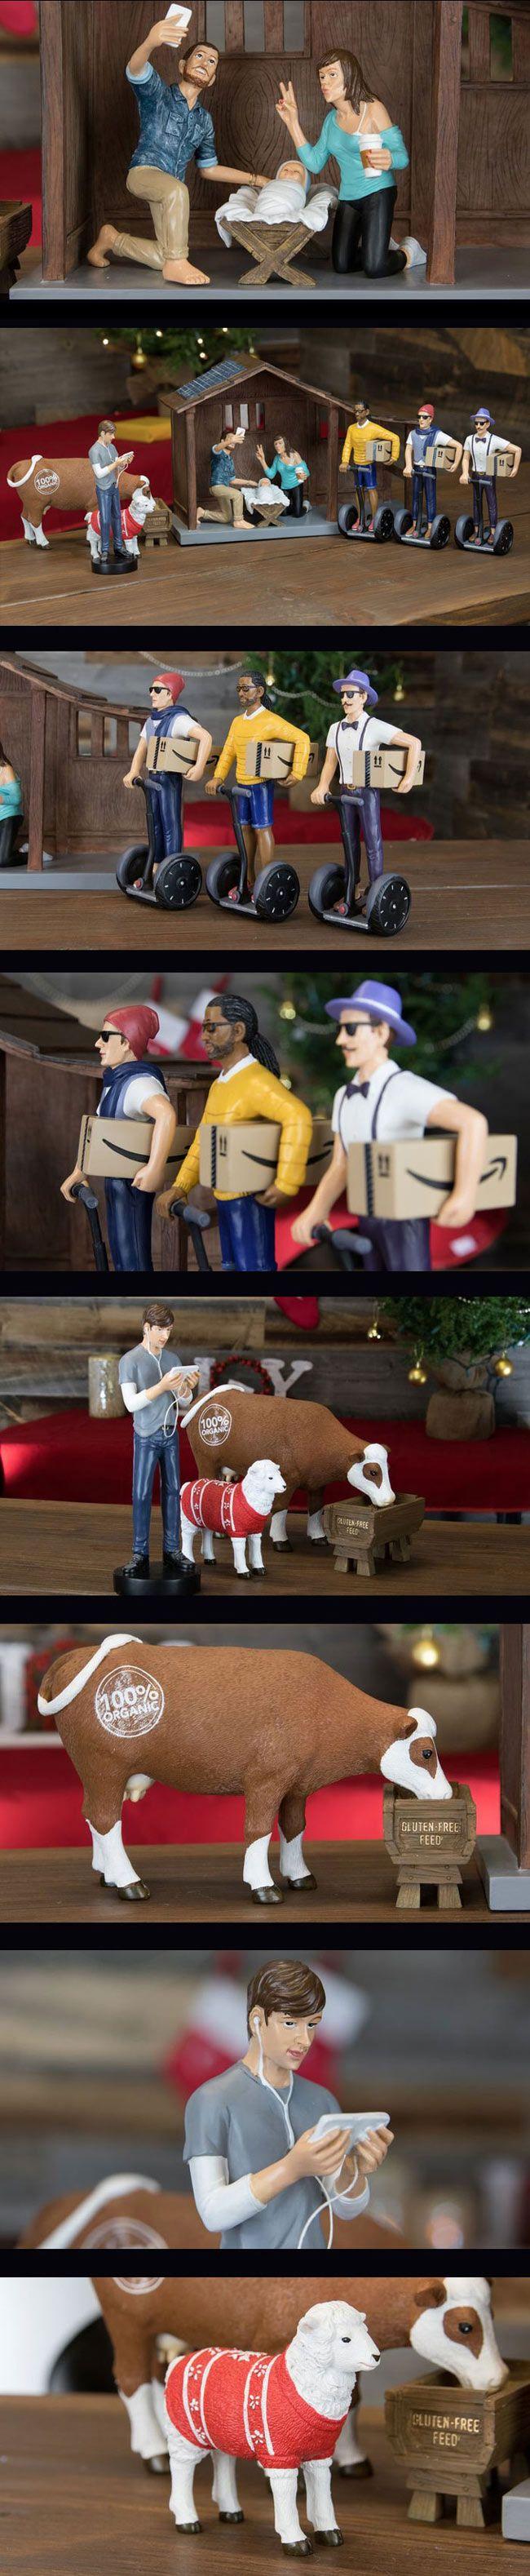 A Hipster Nativity